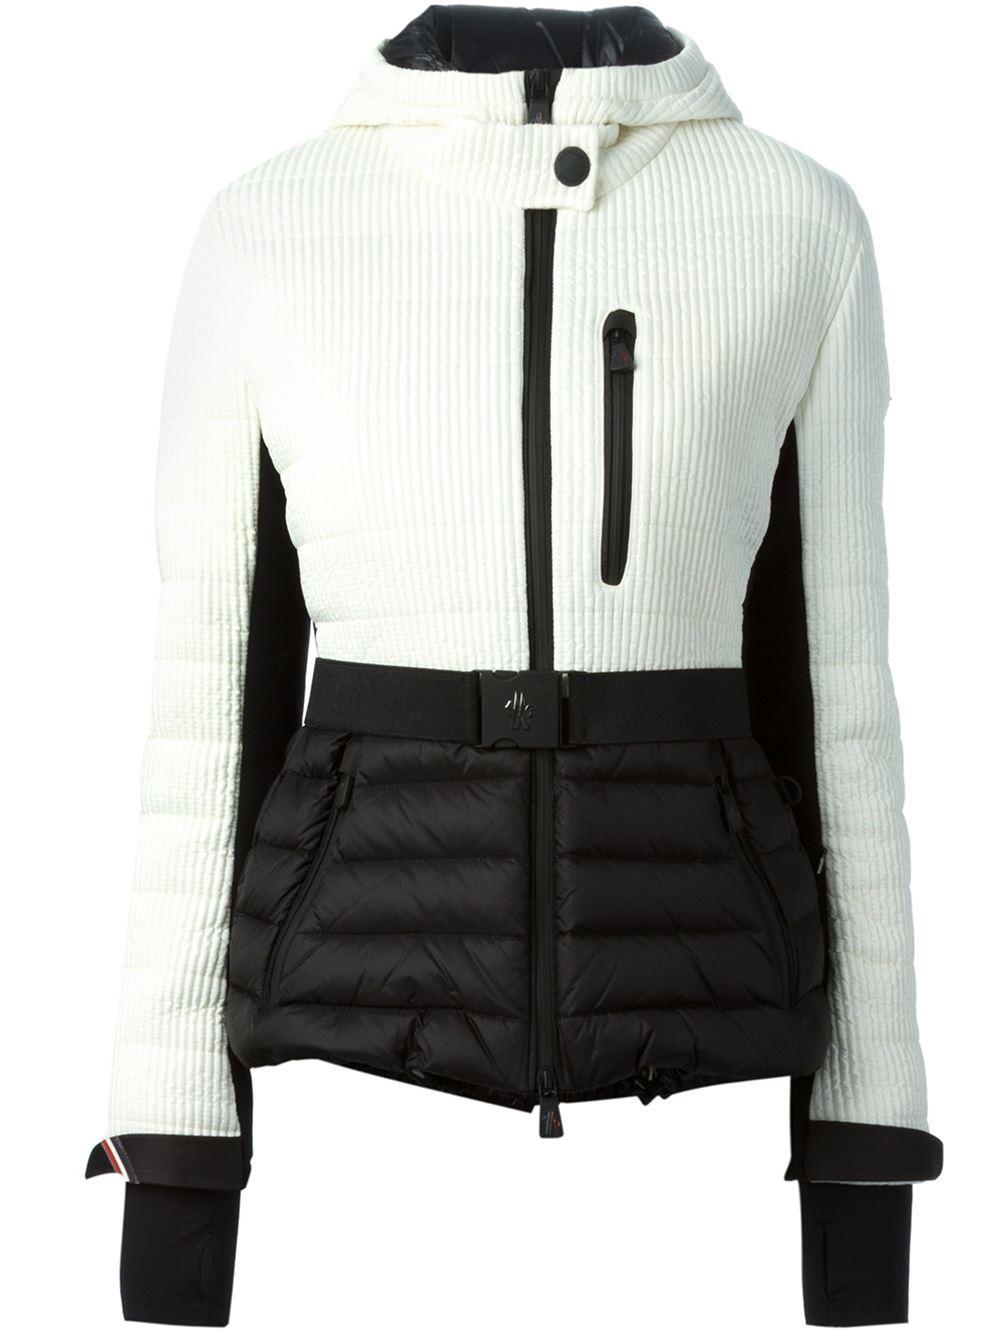 1662f395ee real lyst moncler grenoble bruche ski jacket in white 22468 9170a   clearance lyst moncler grenoble ribbed belted padded jacket in black 6d2f4  30cc5